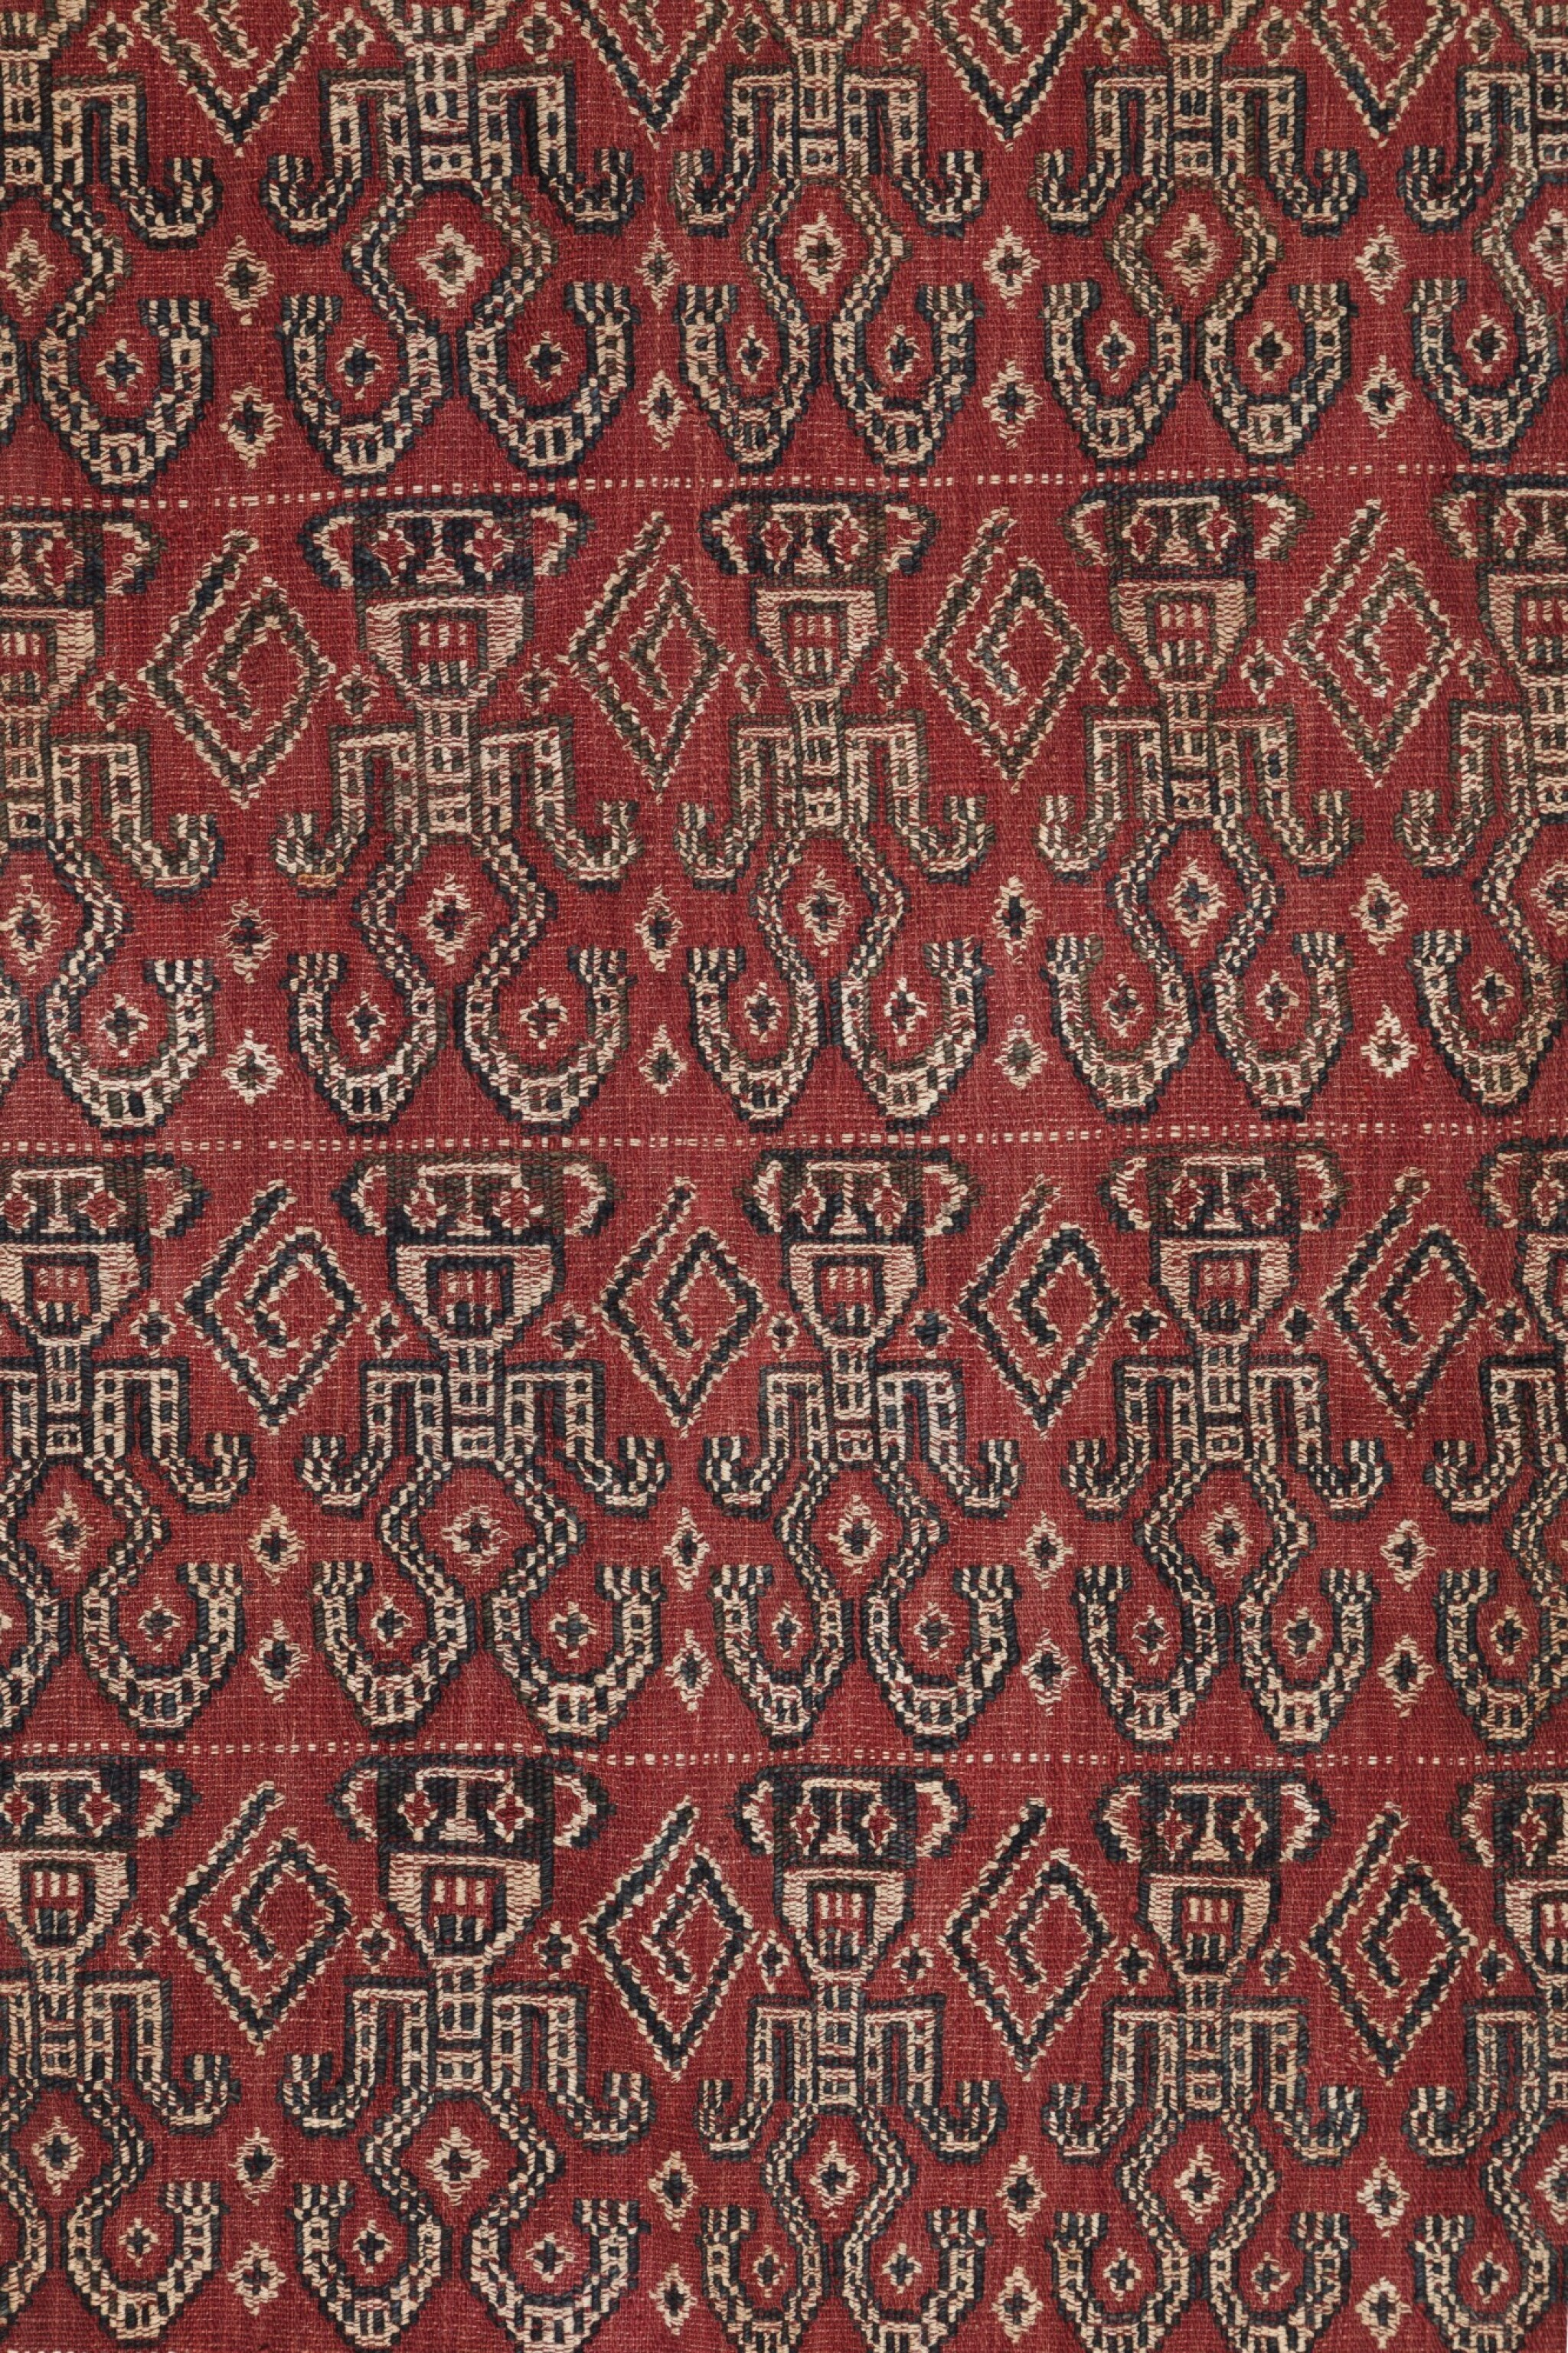 View full screen - View 1 of Lot 38. Tissu cérémoniel pua, Iban, Bornéo, Indonésie, début du 20e siècle | Ceremonial cloth pua, Iban, Borneo, Indonesia, early 20th century.